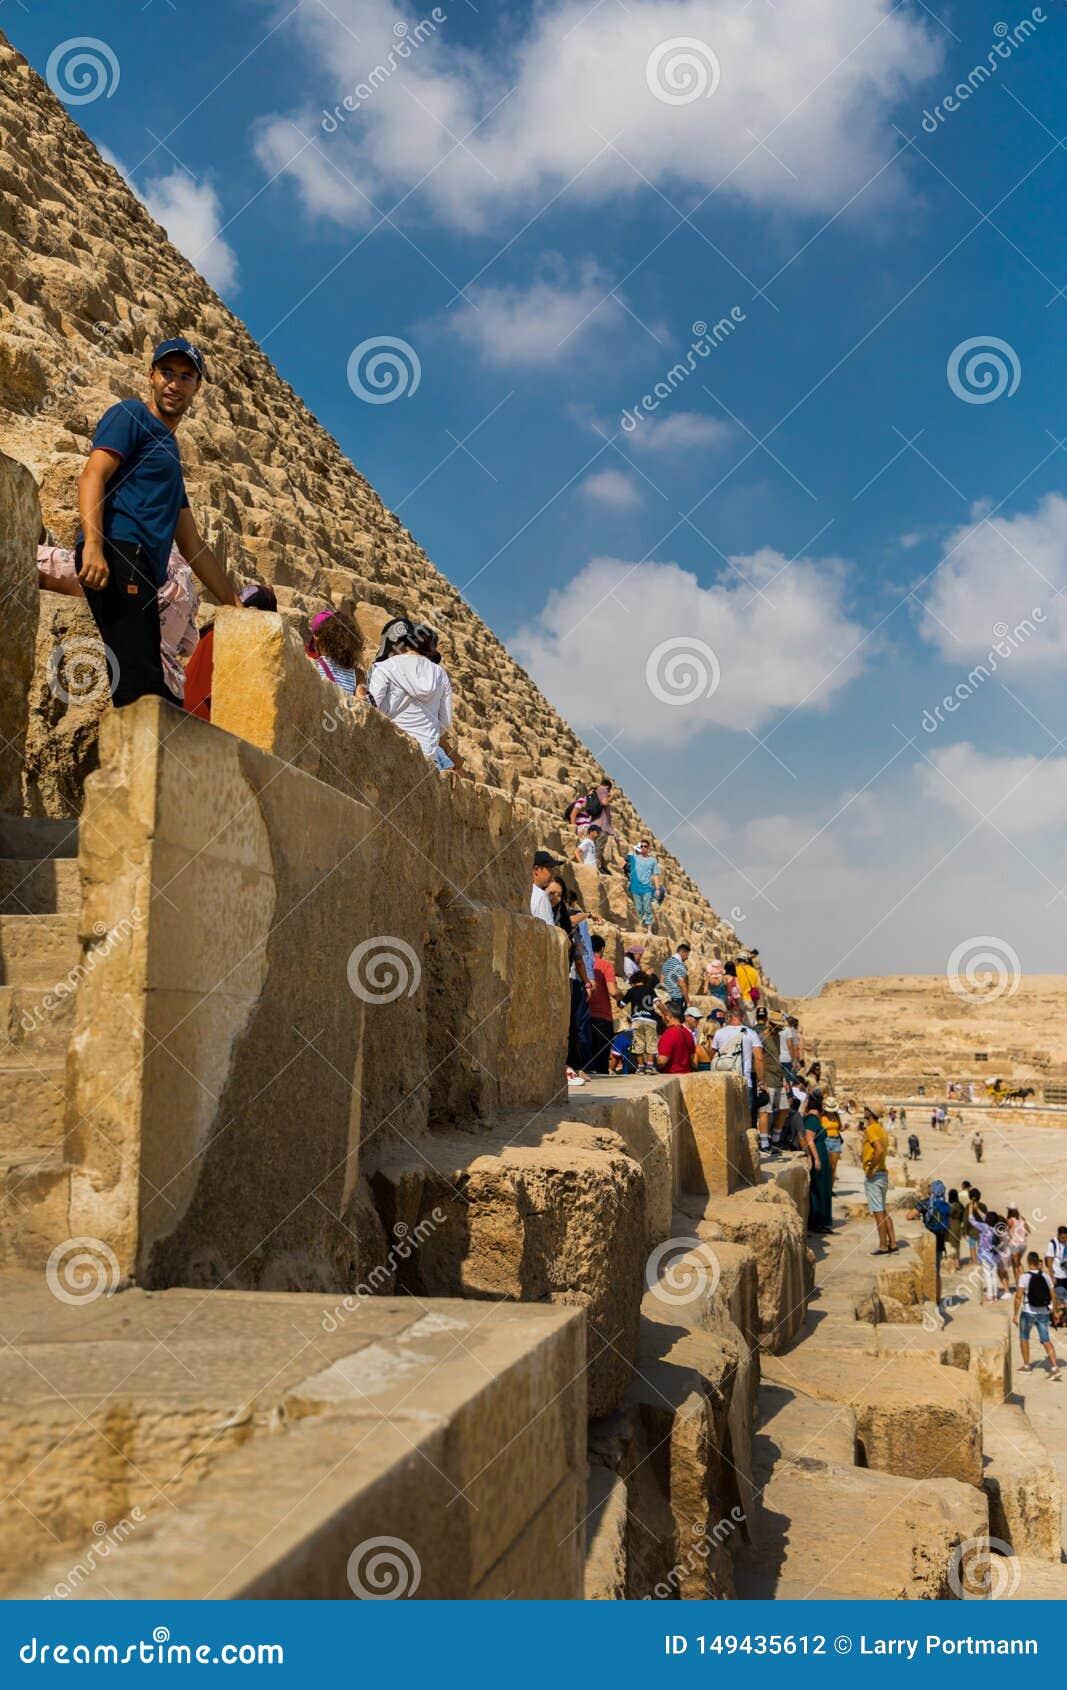 Tourists climbing the pyramids of Giza, Egypt